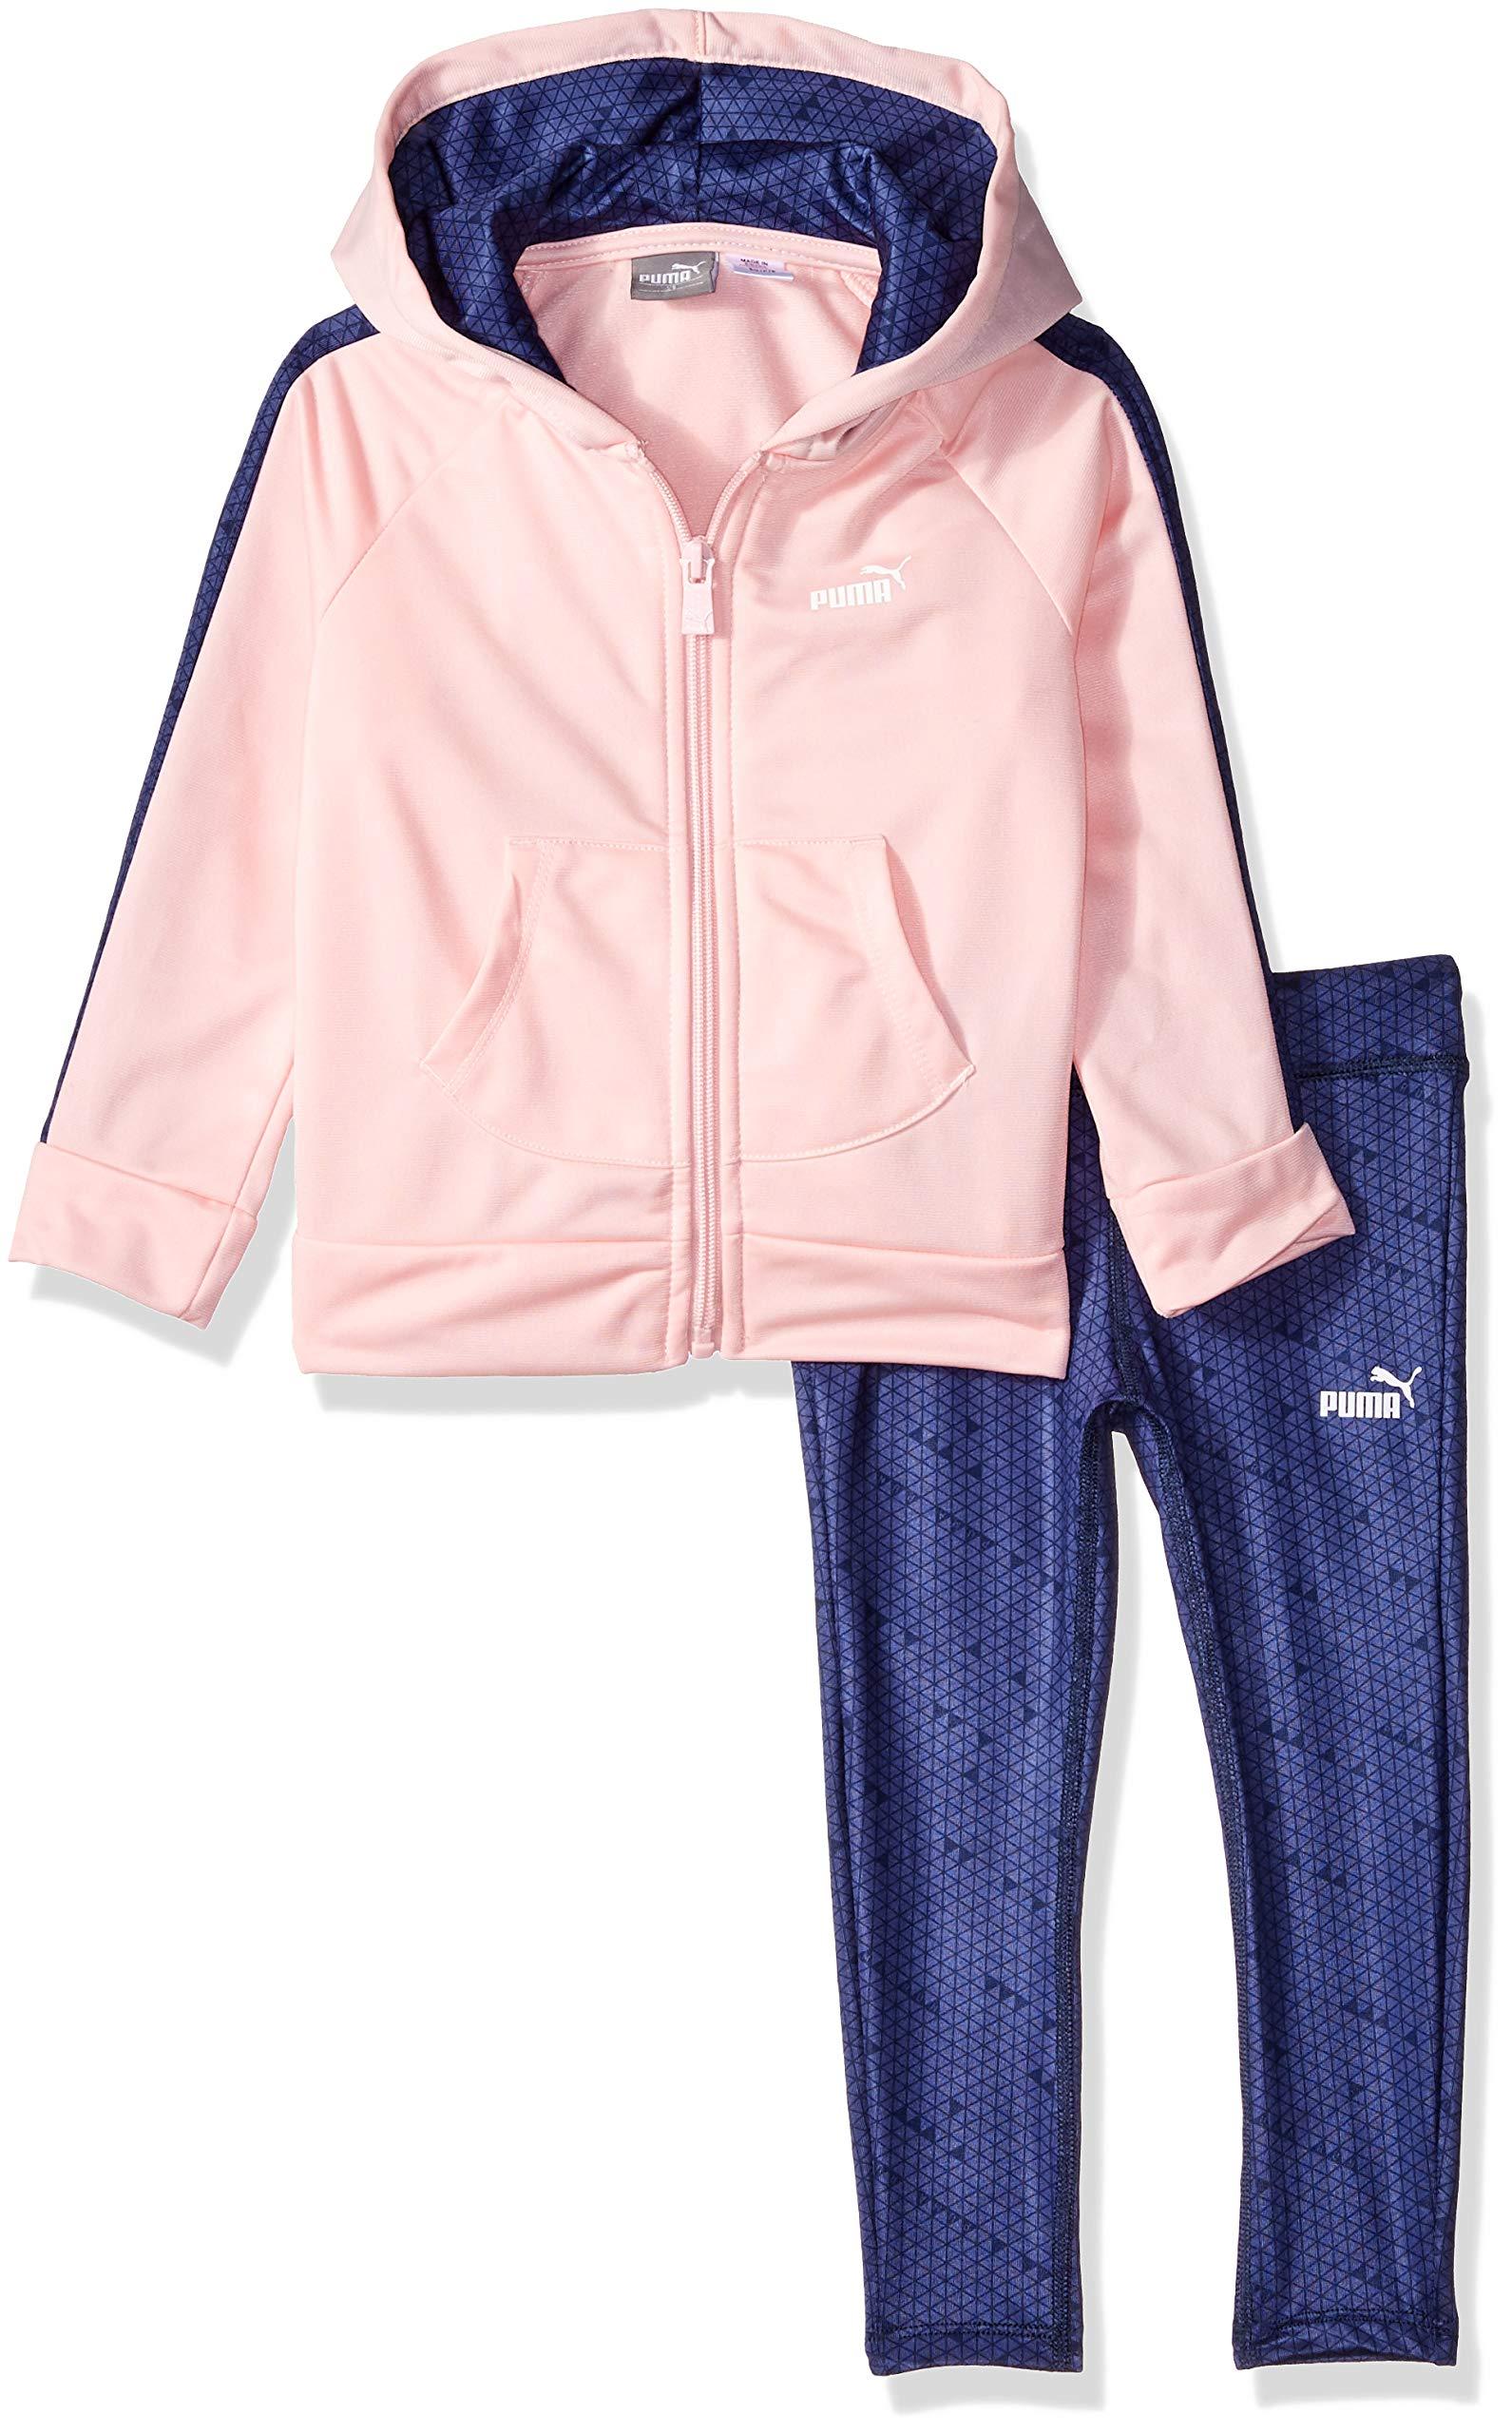 PUMA Toddler Girls' Track Jacket and Legging Set, Crystal Rose, 3T by PUMA